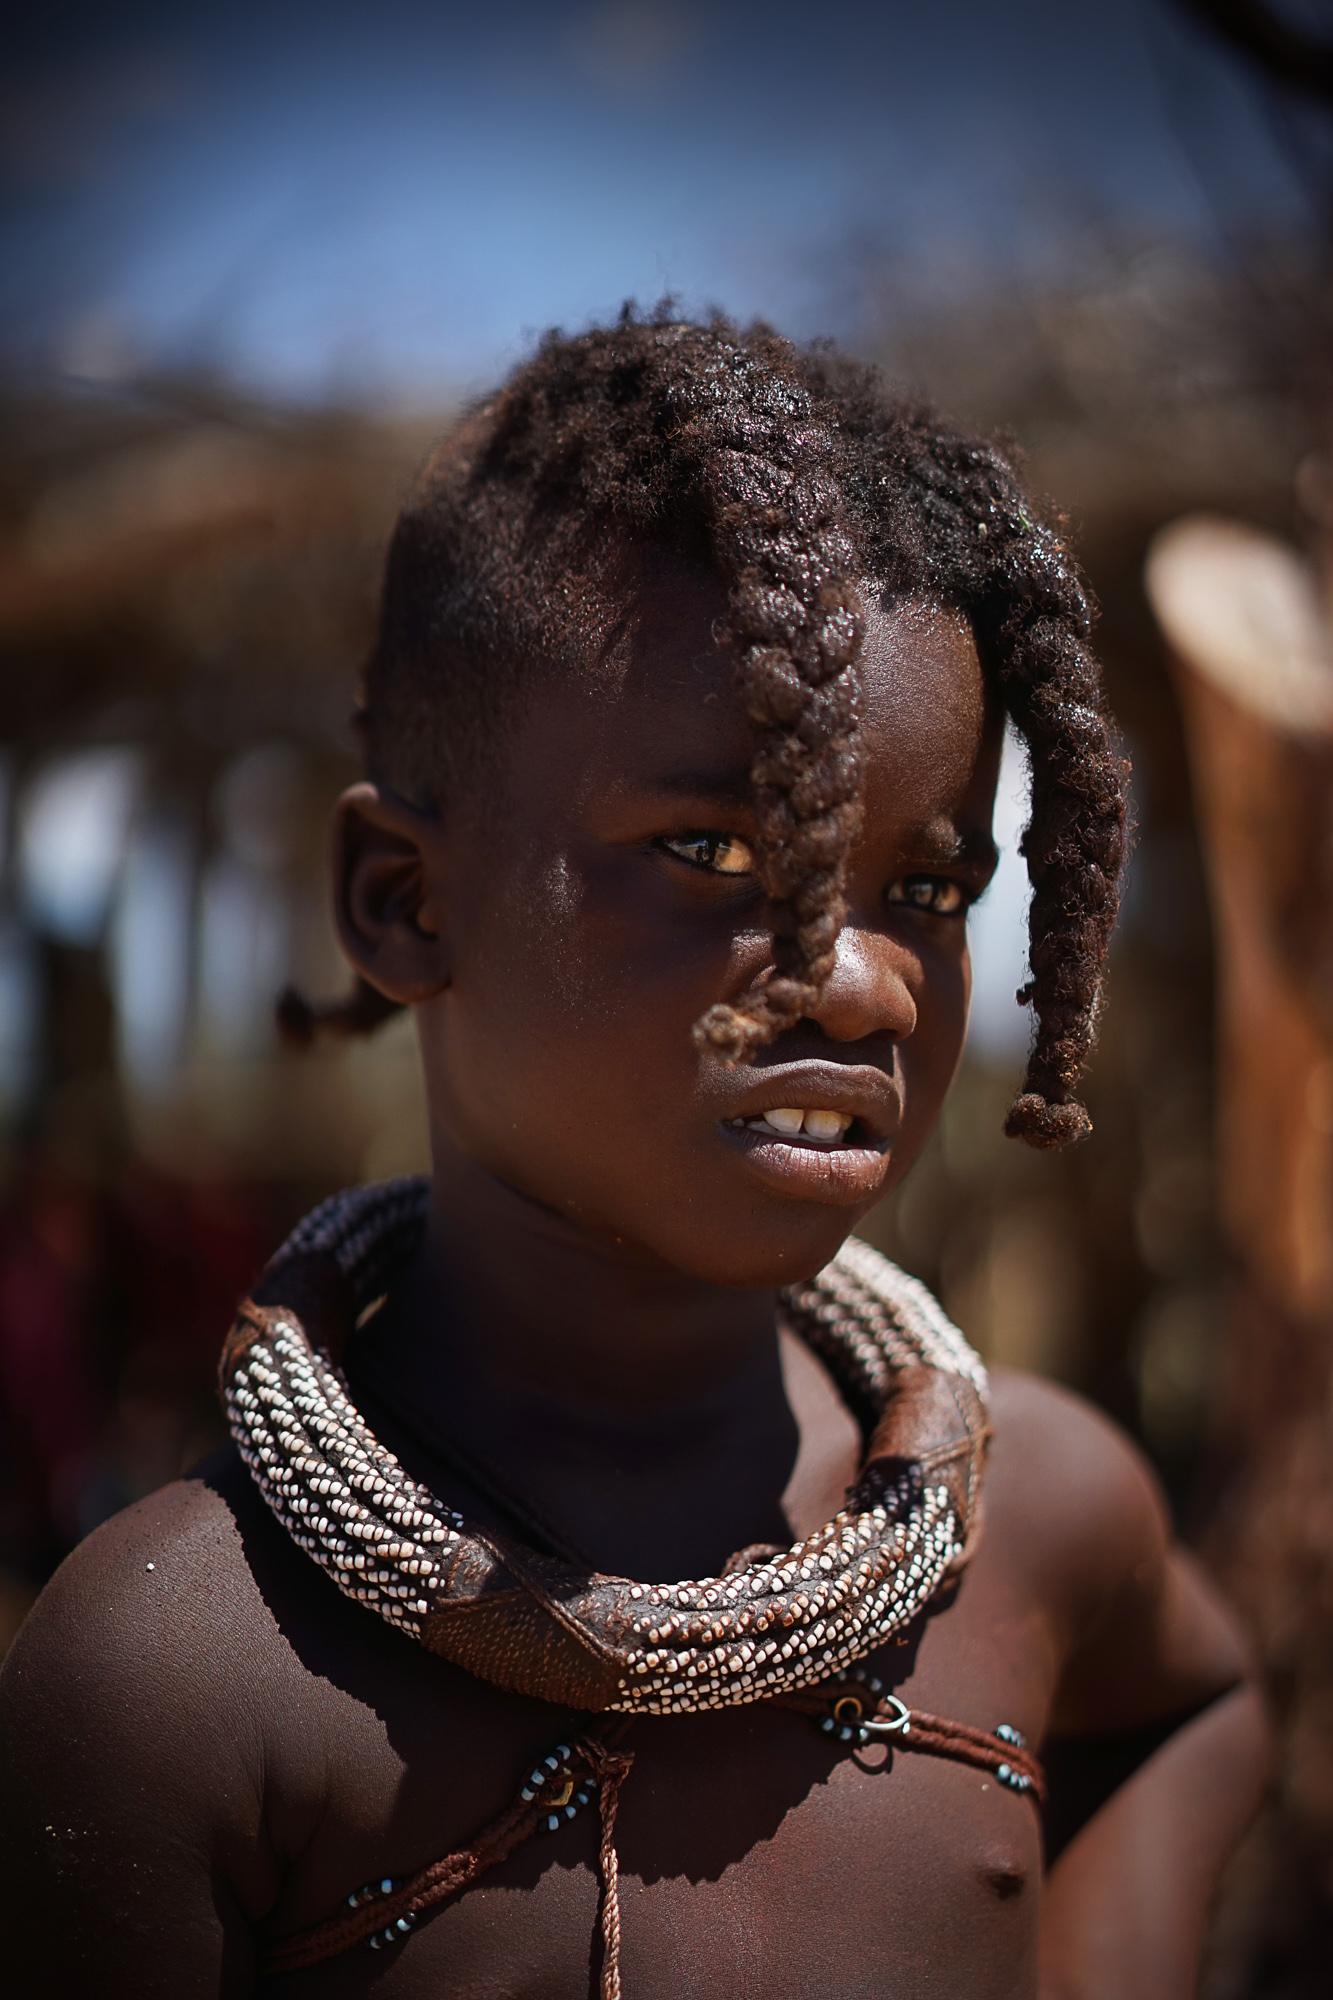 Garota Himba - Namíbia